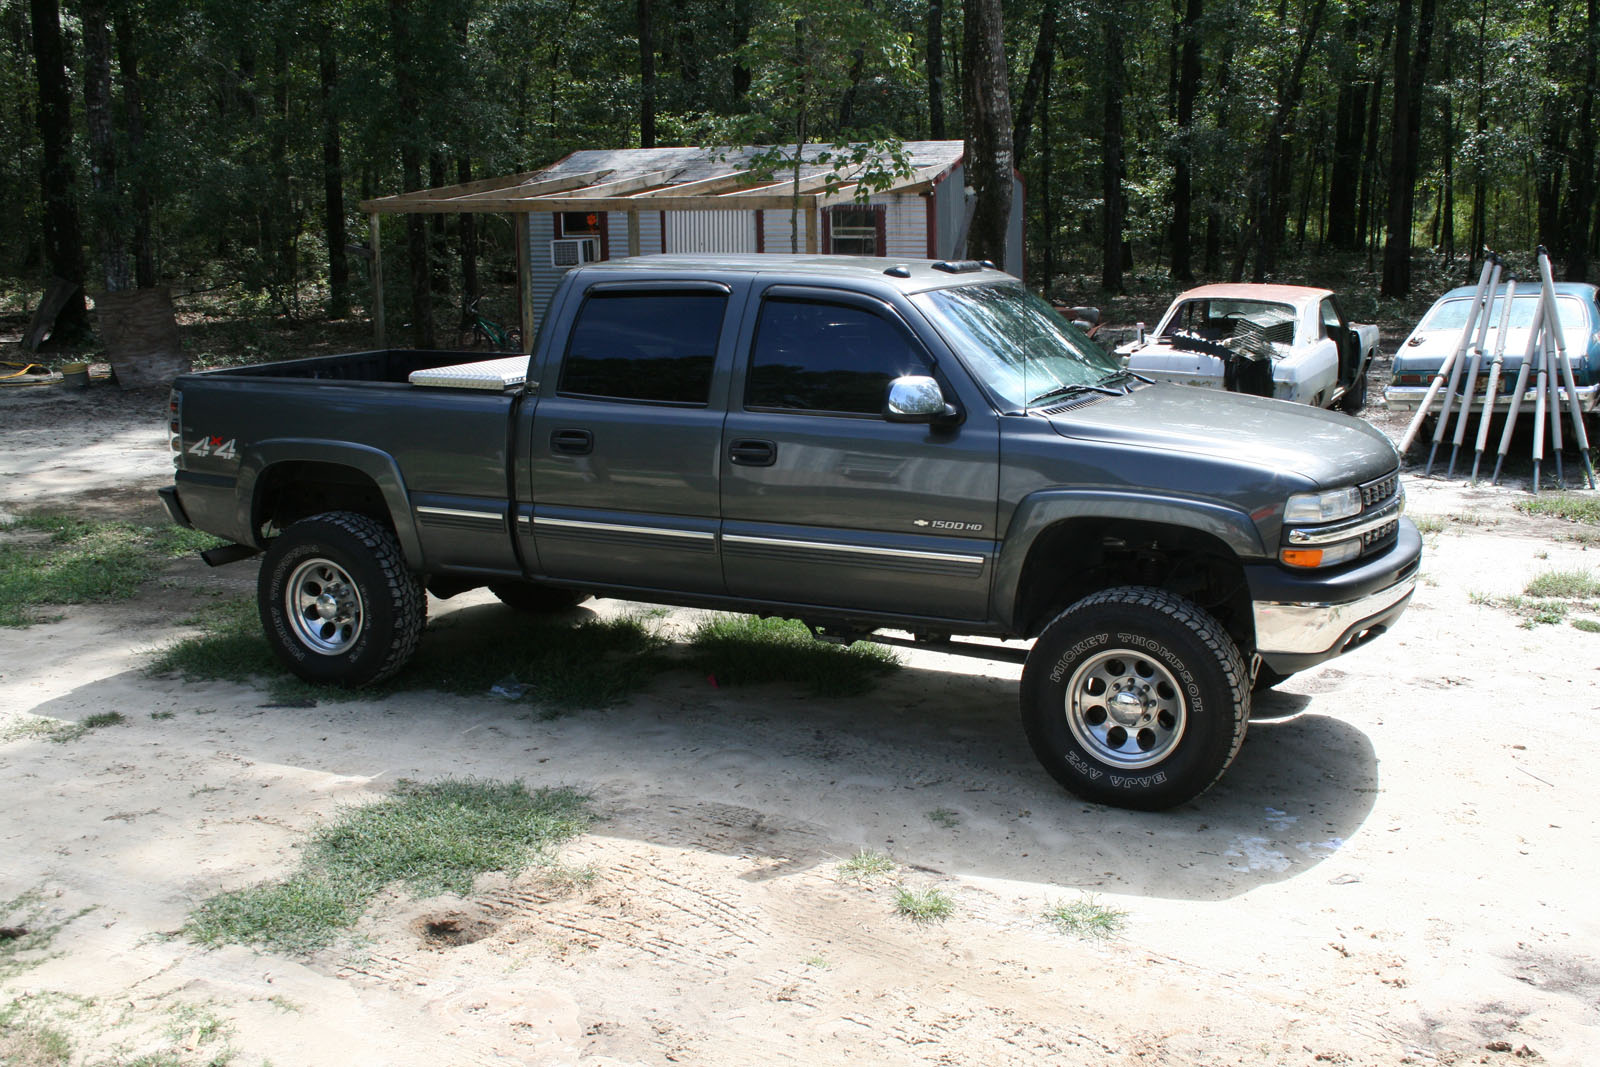 All Chevy chevy 1500 hd : 2002 Chevrolet 1500 hd For Sale   Ridgeland South Carolina